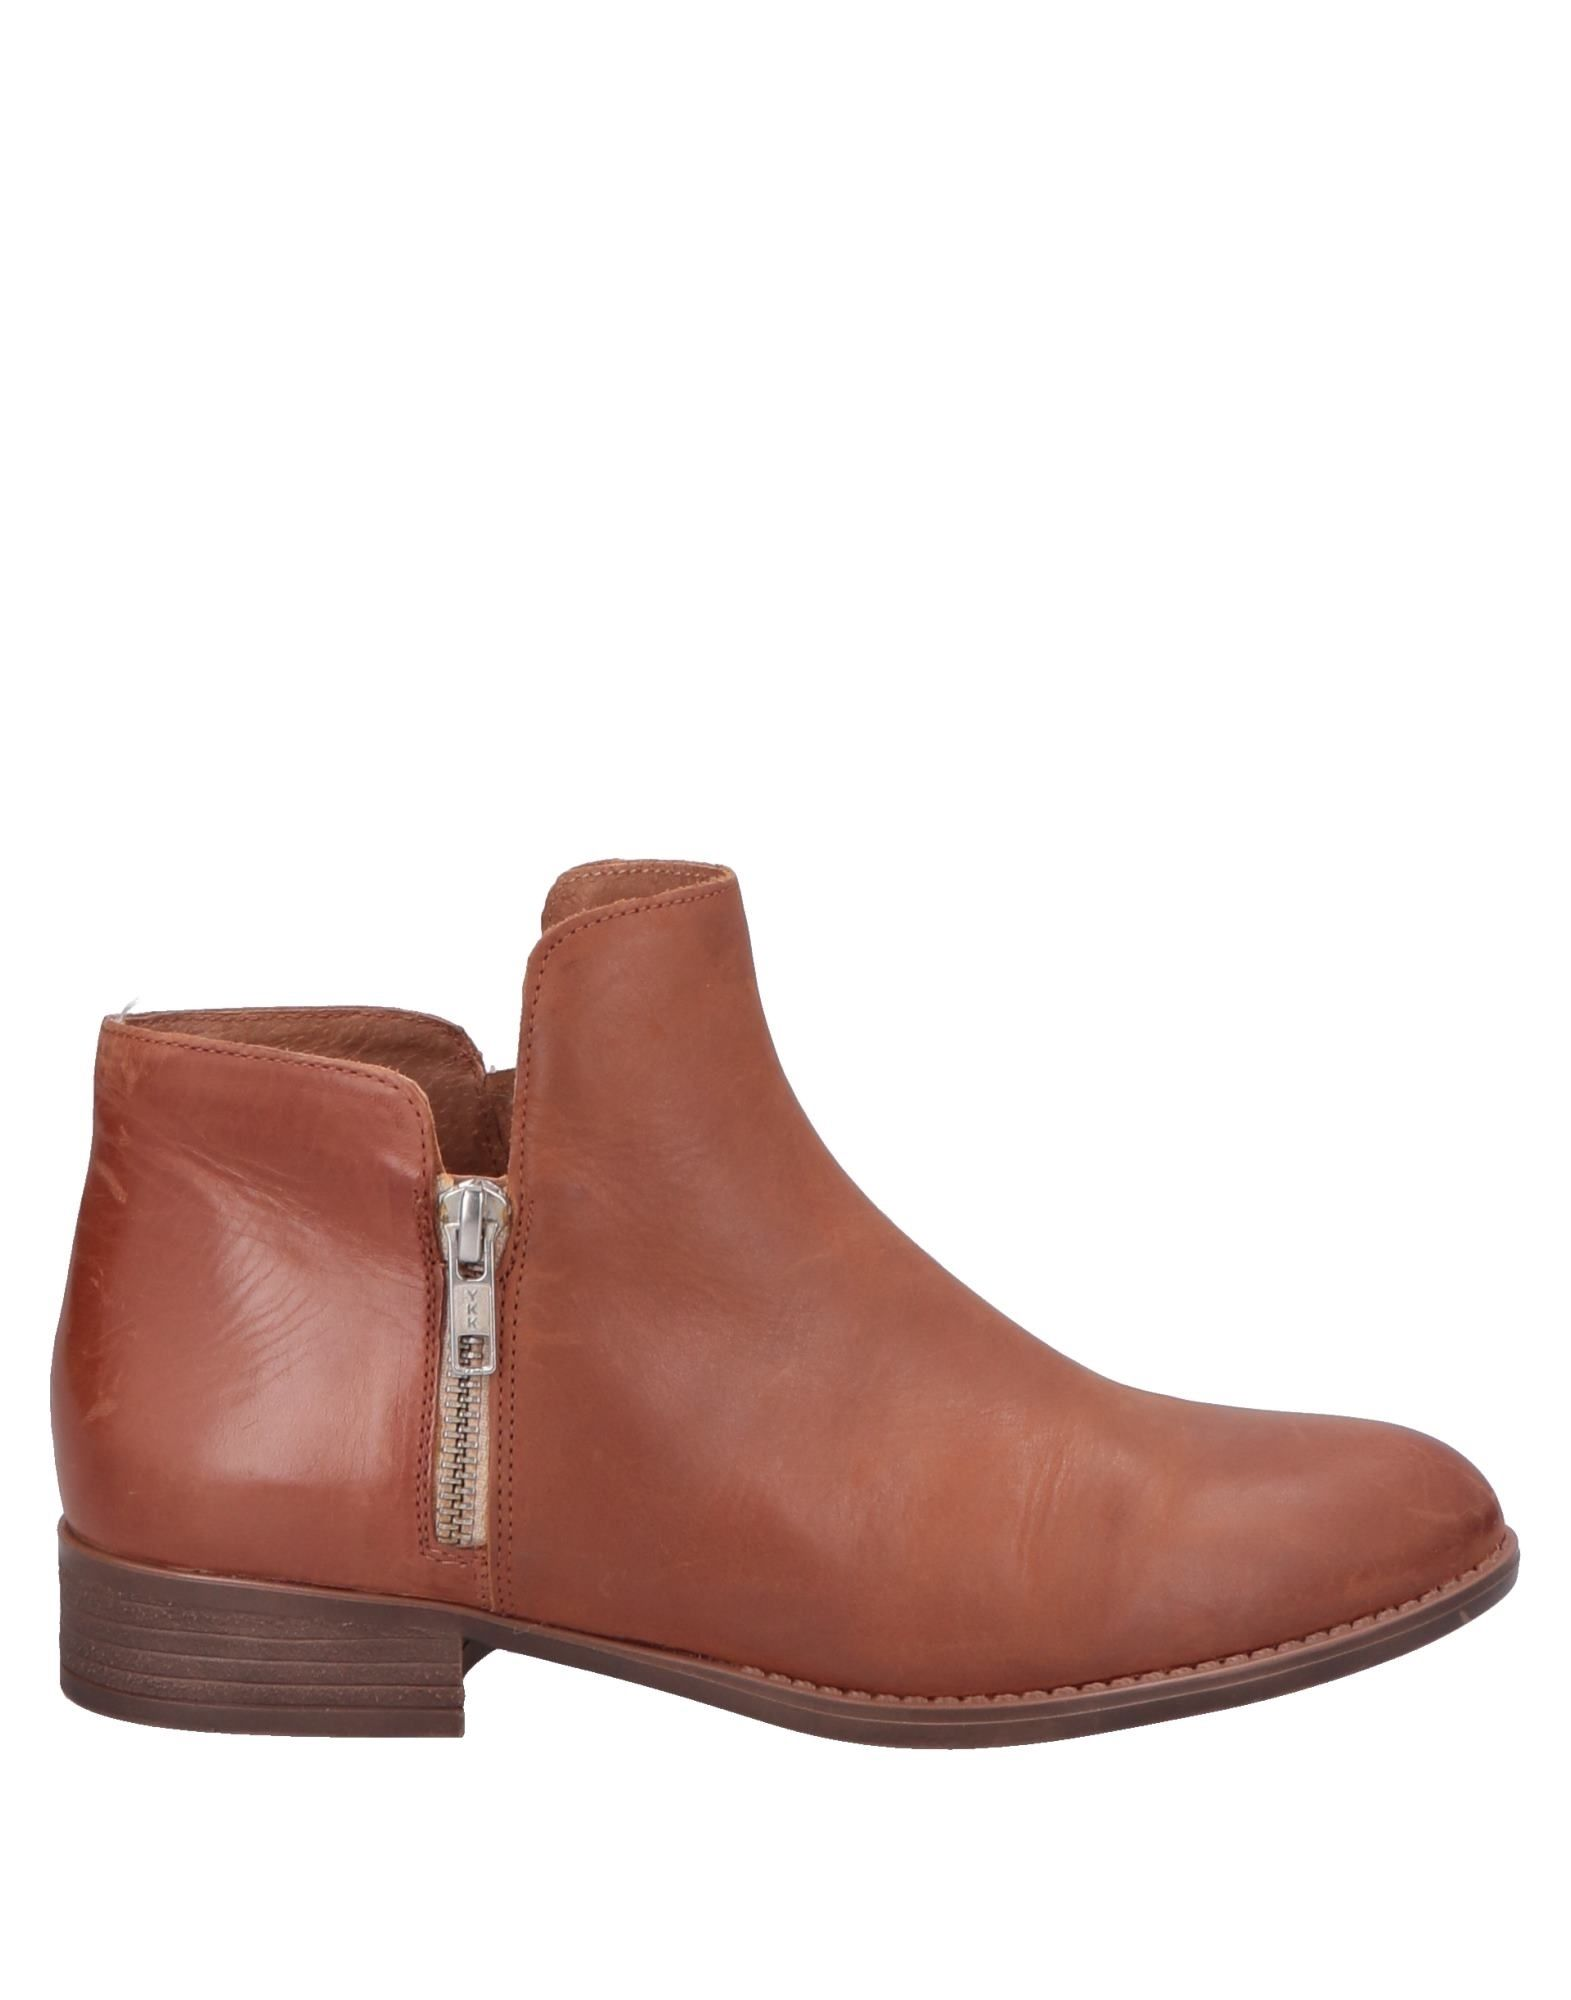 ELIANA BUCCI Полусапоги и высокие ботинки eliana bucci полусапоги и высокие ботинки